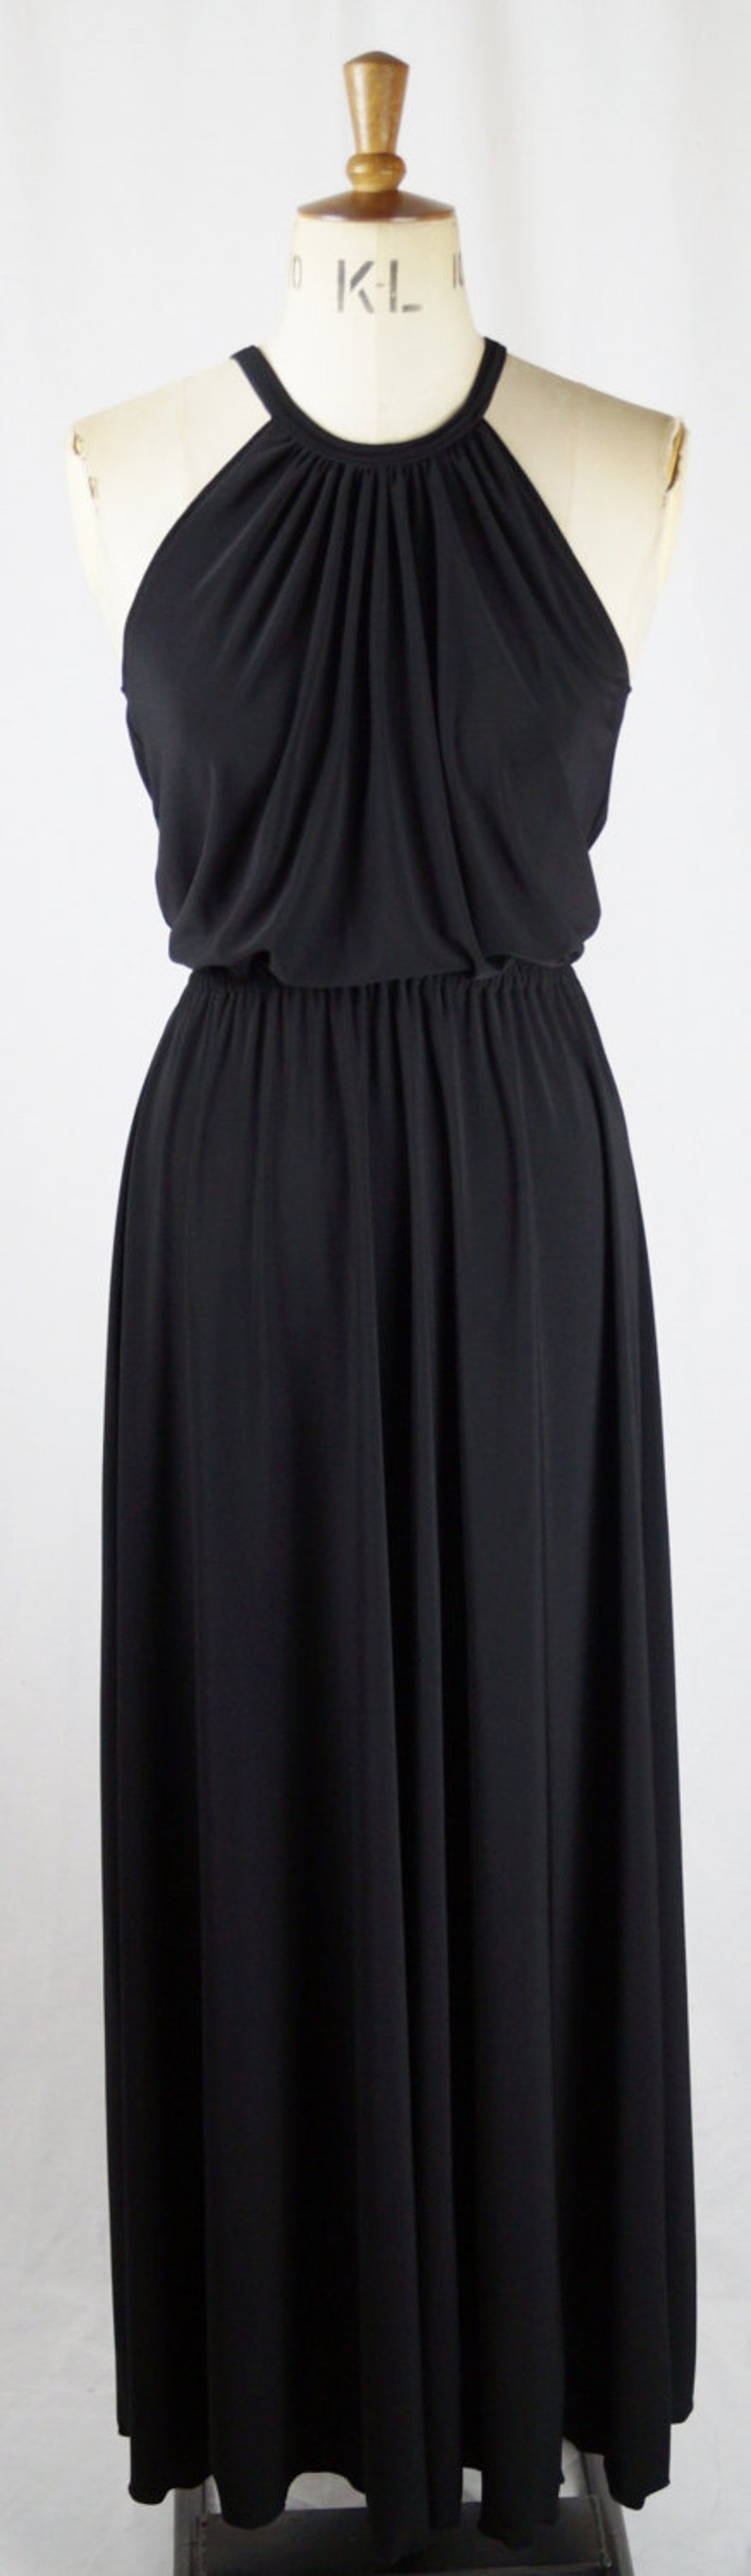 70s Sequin Dresses, Disco Dresses Baylis & Knight Black Grecian Studio 54 High Neck Maxi Dress Elegant Long Formal Gown Relaxed 70s Chic $100.39 AT vintagedancer.com